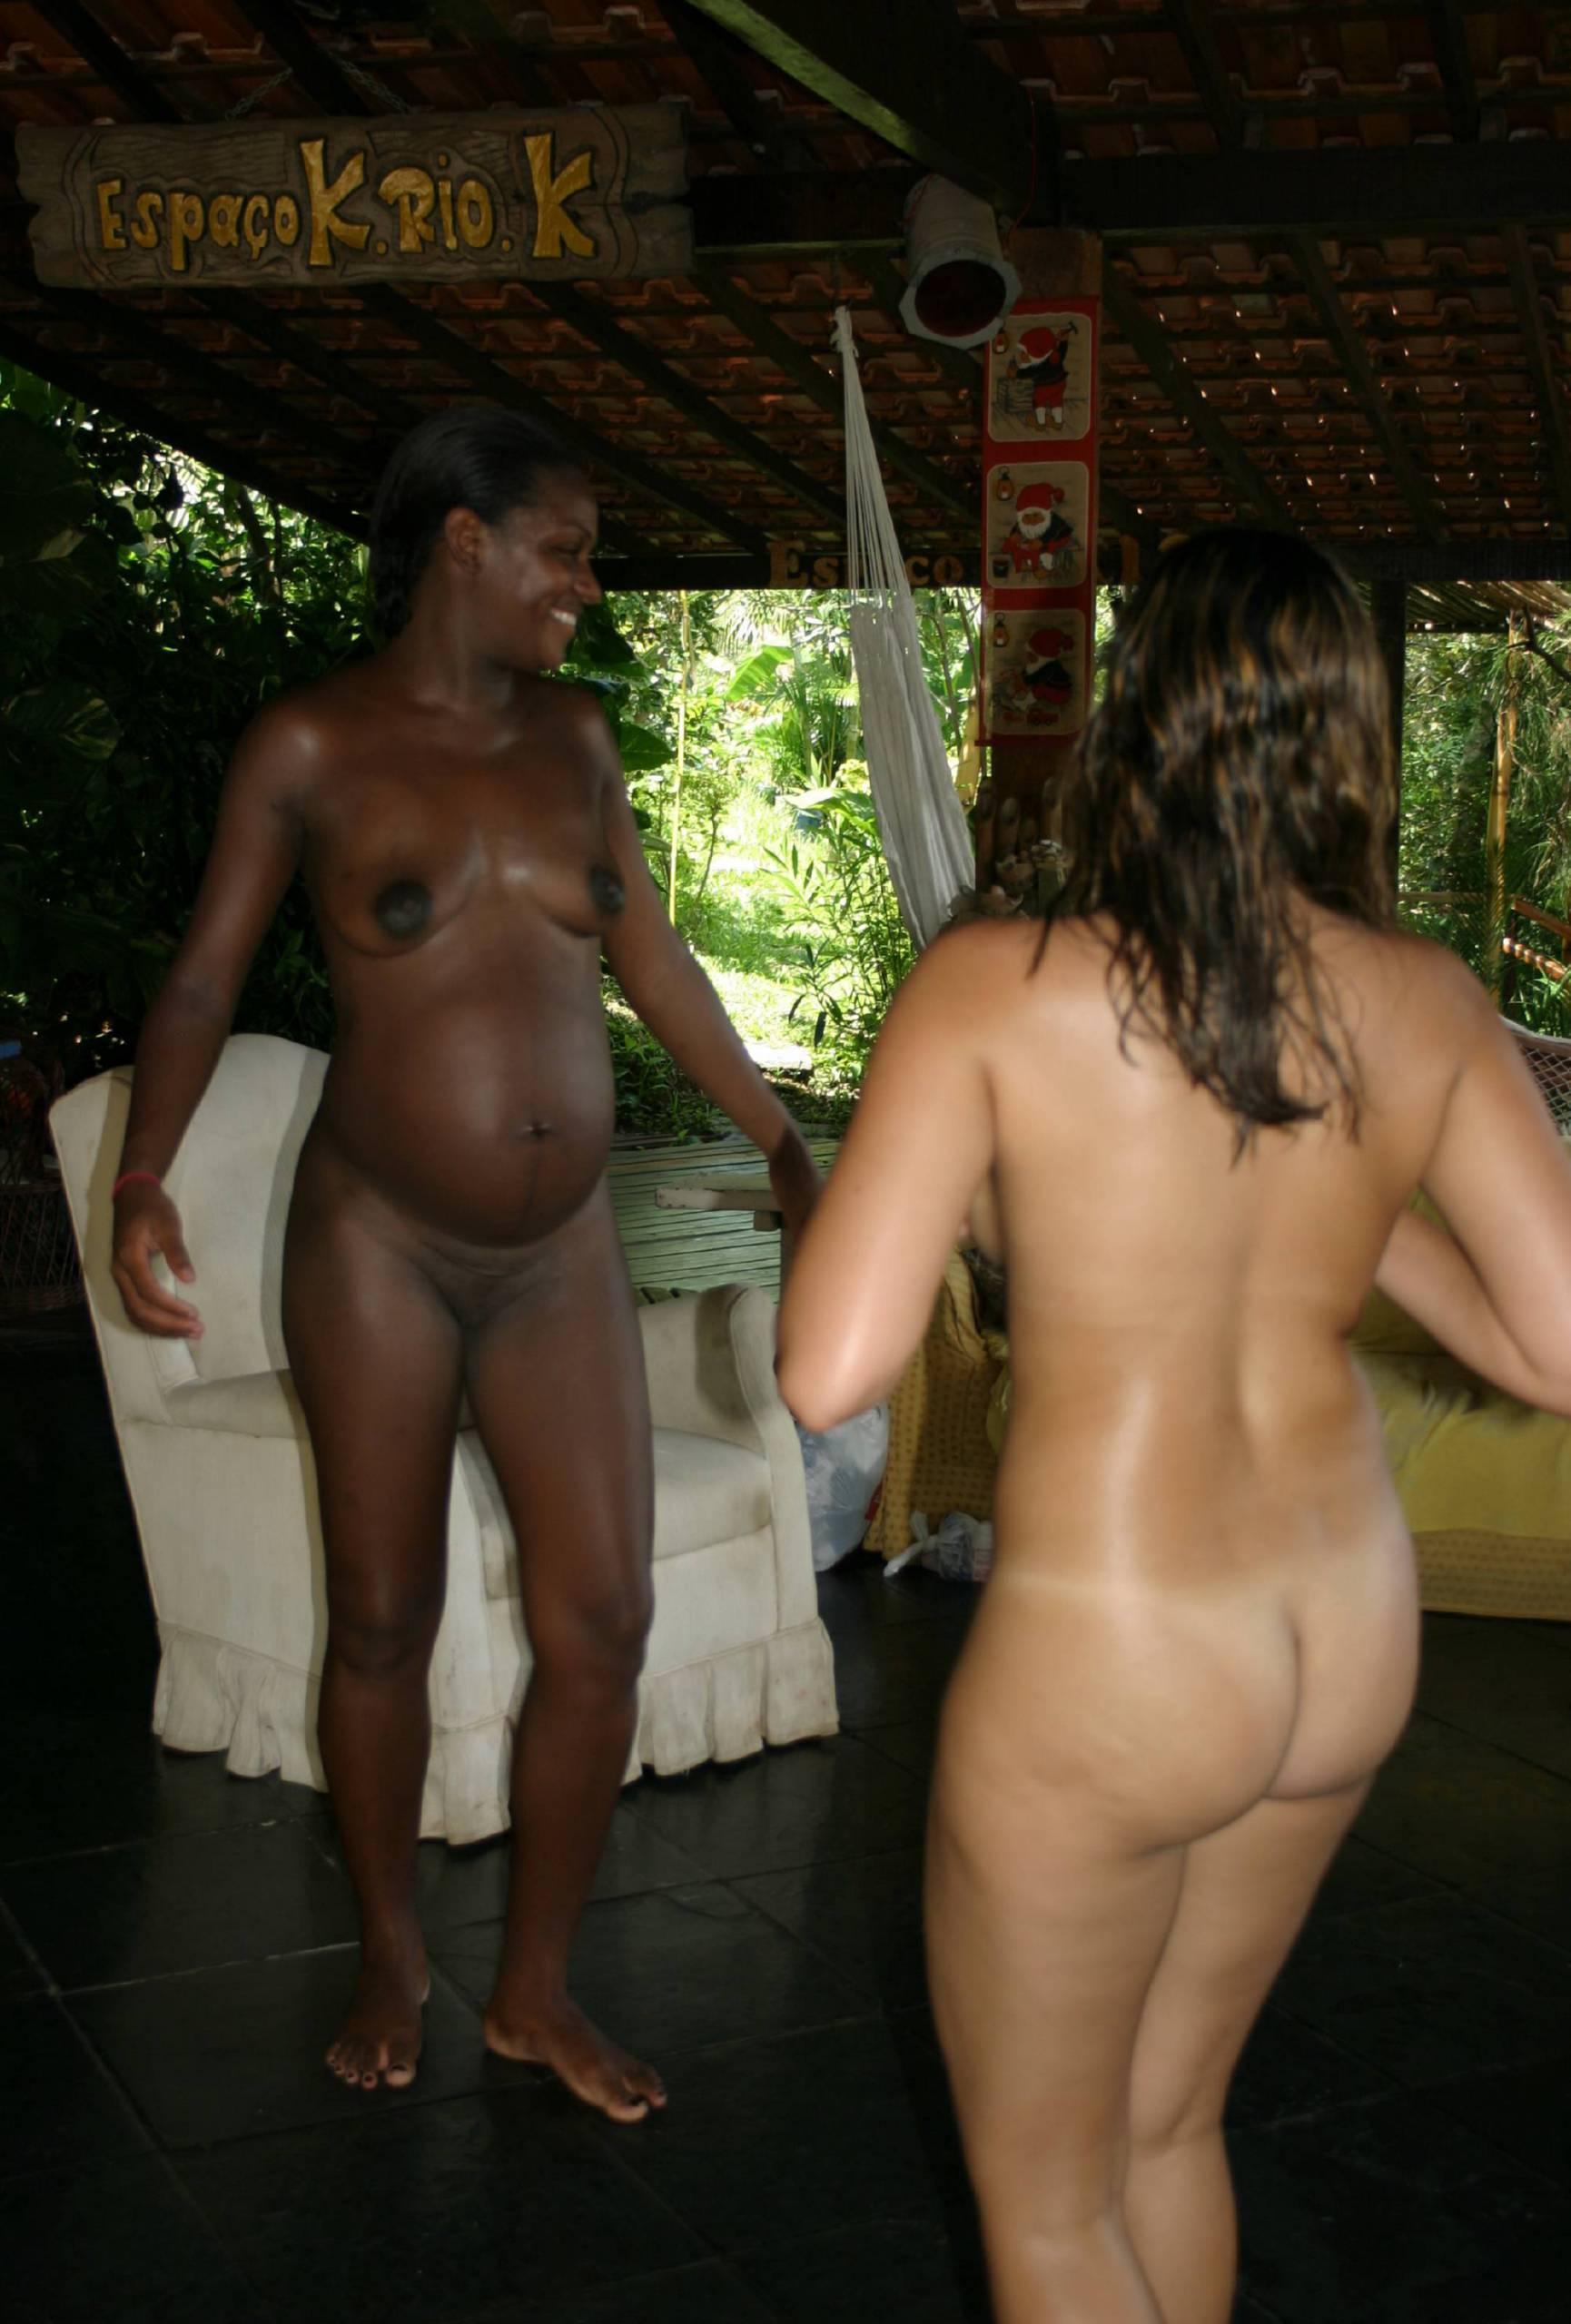 Brazilian Dance and Profiles - 1